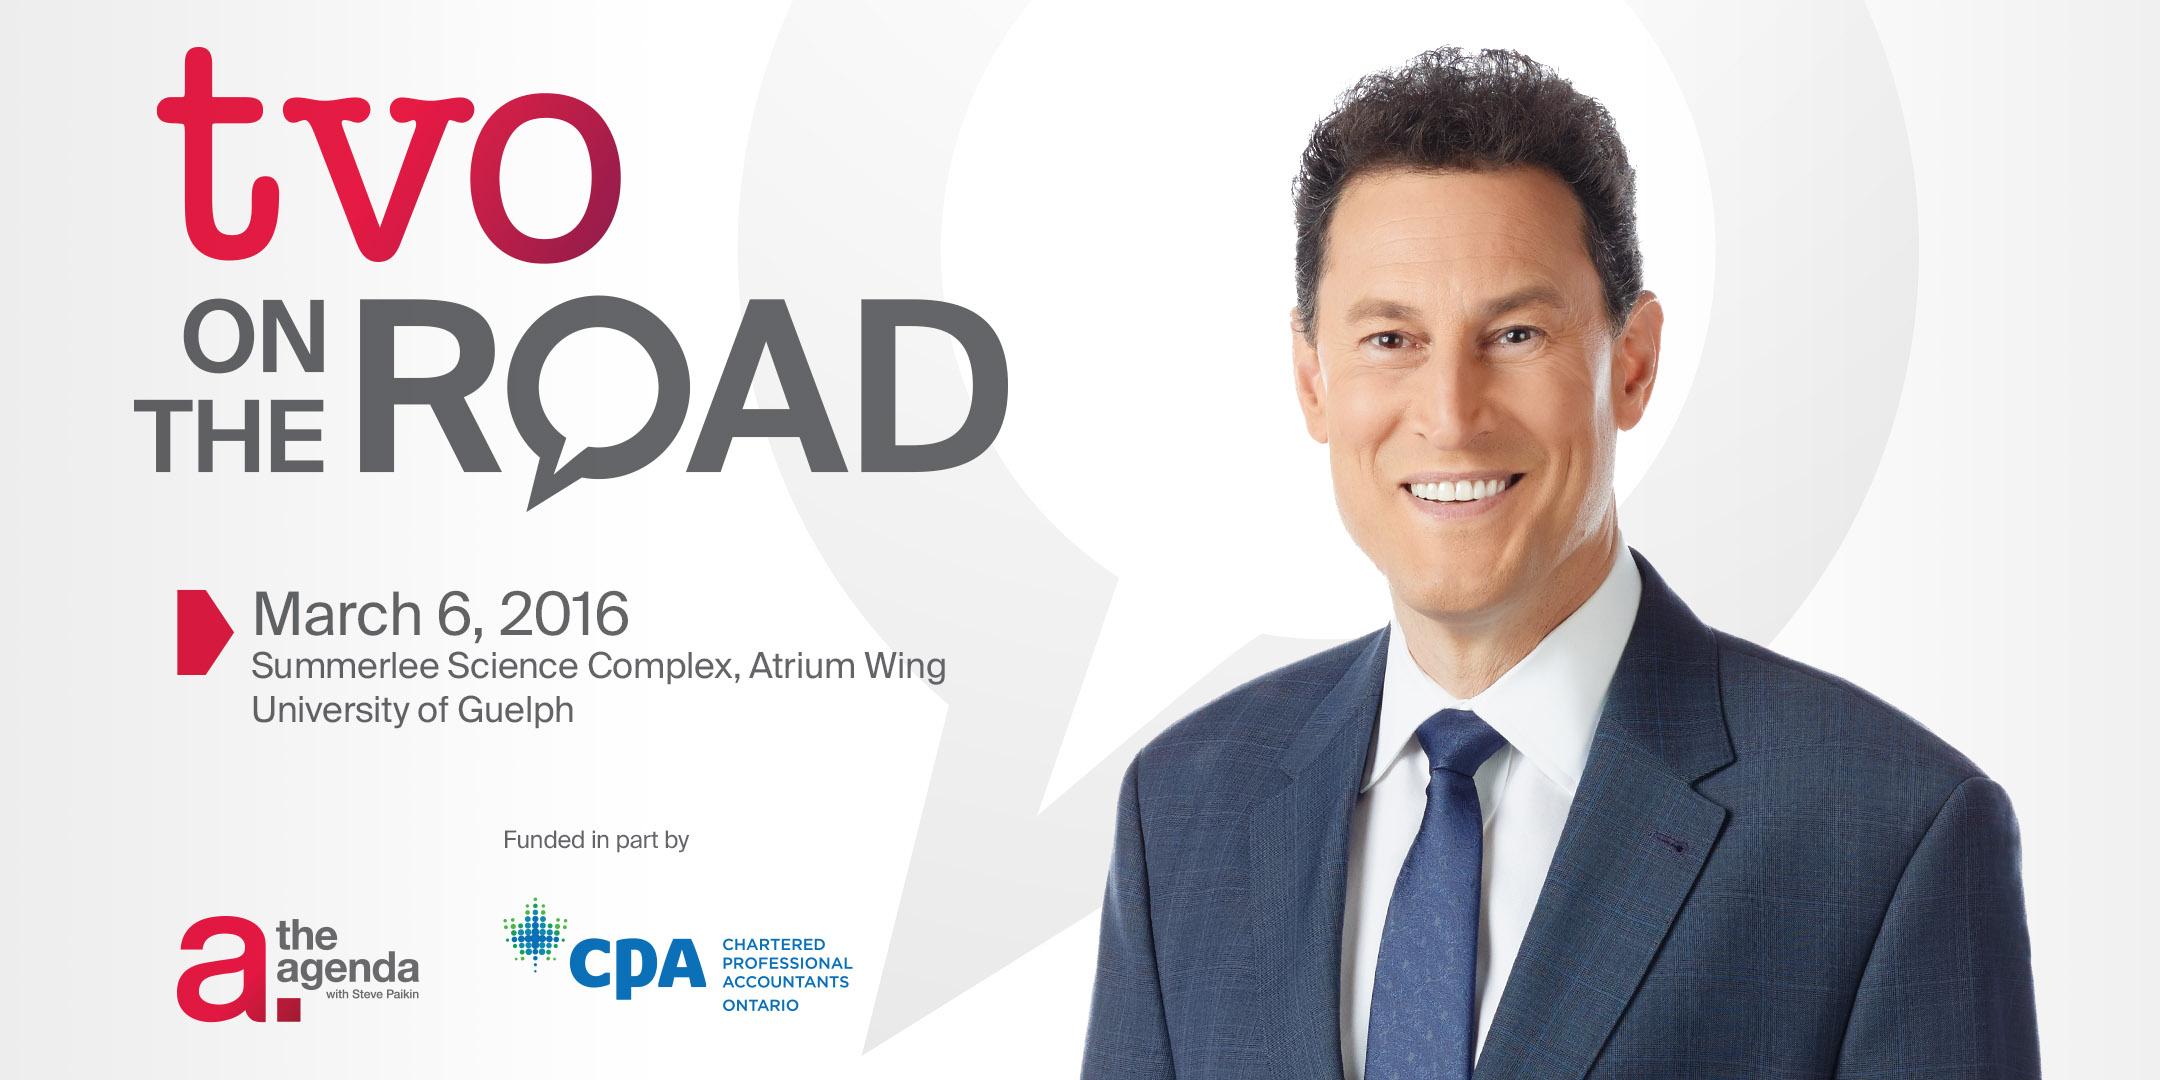 TVO On The Road logo, Steve Paikin host of The Agenda